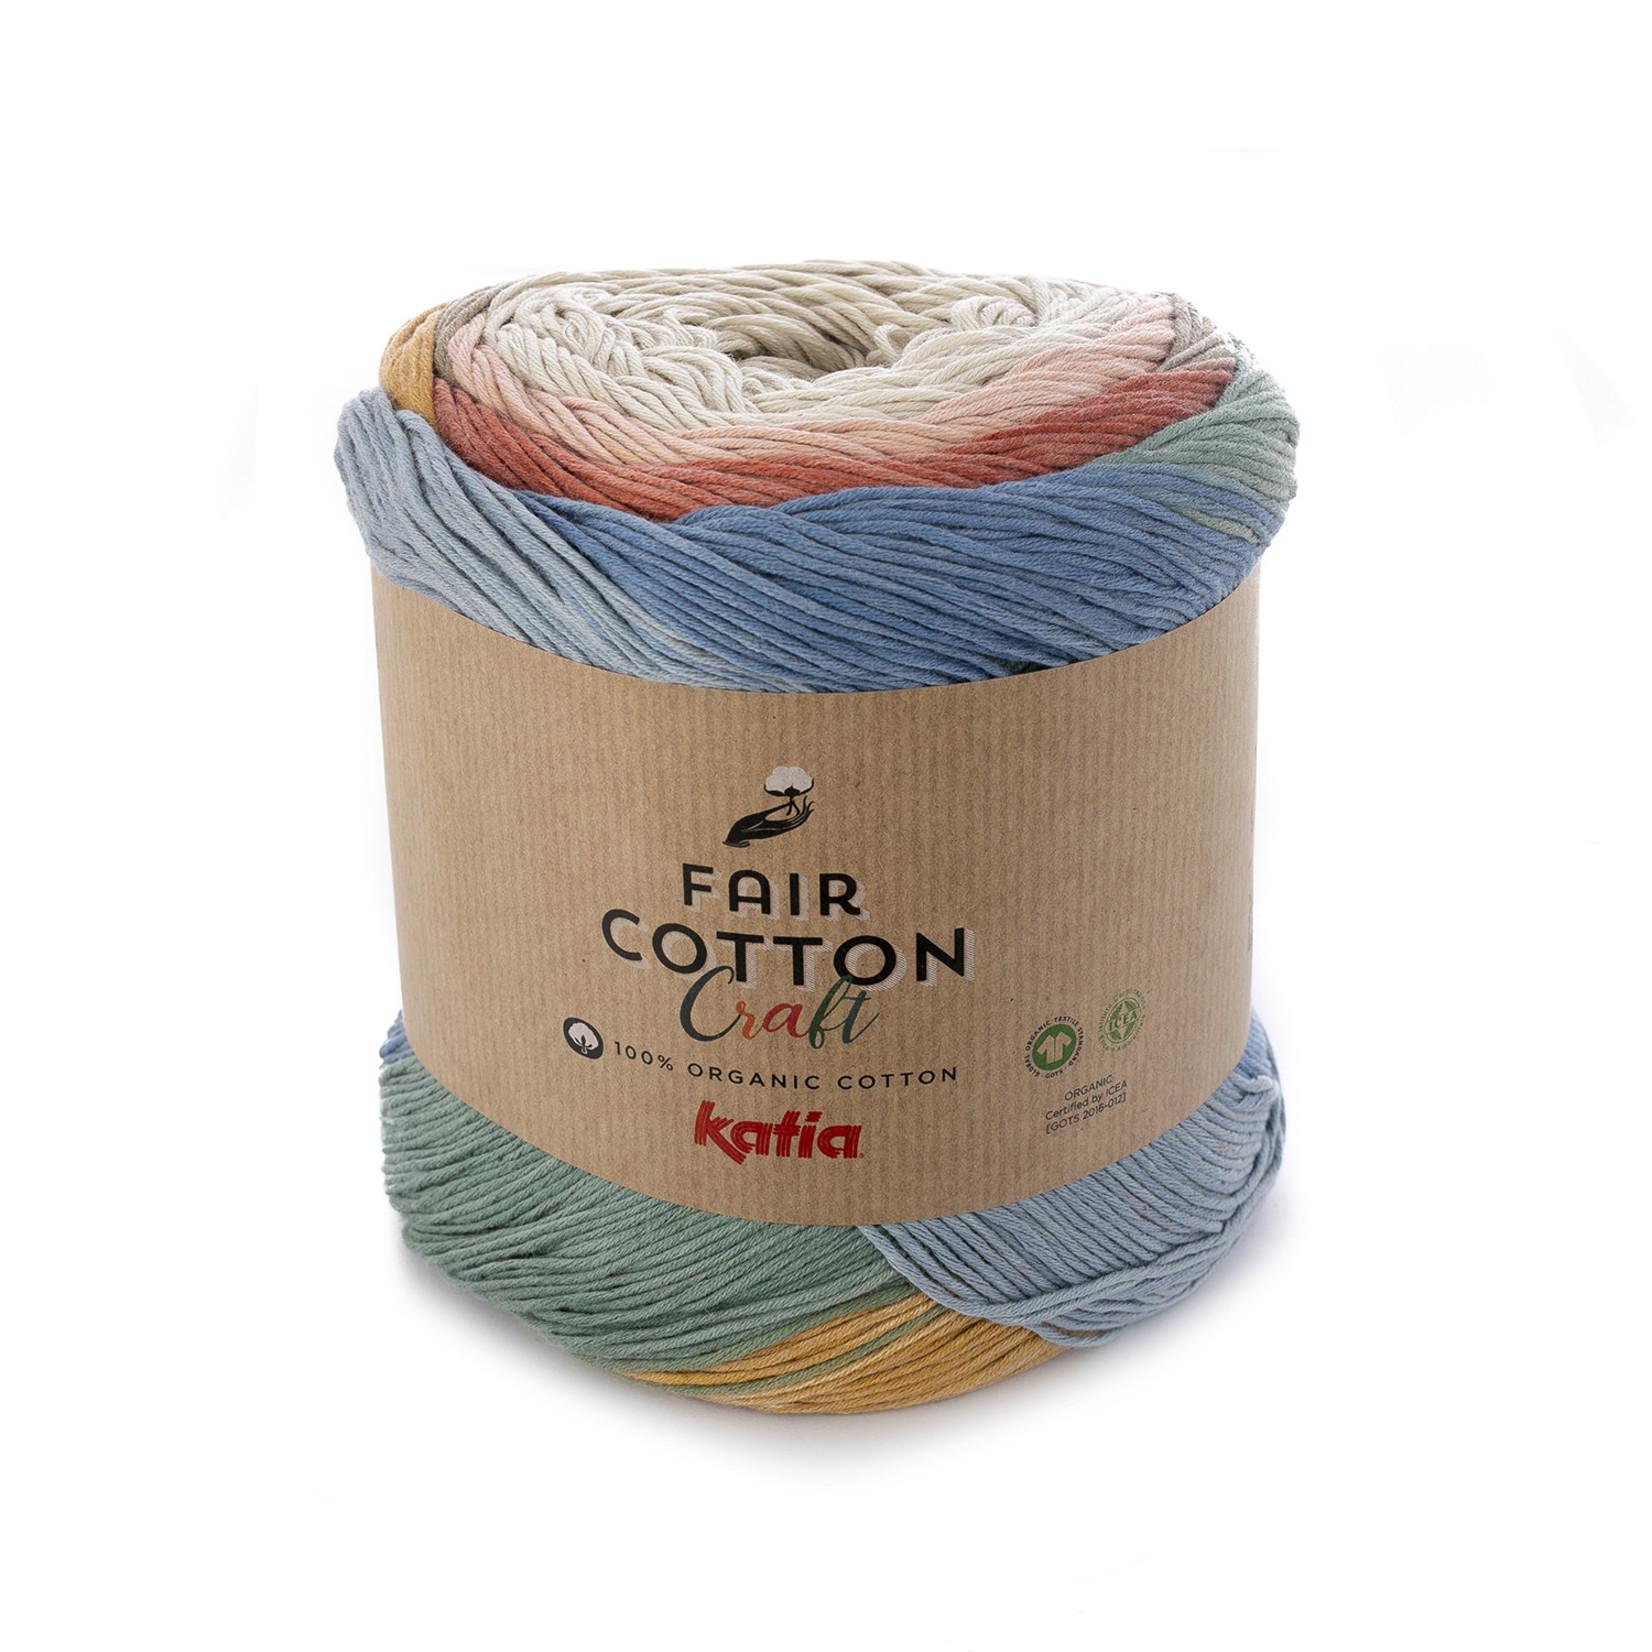 Katia Katia Fair Cotton Craft verloopgaren Kleur 500 - 200 gr.